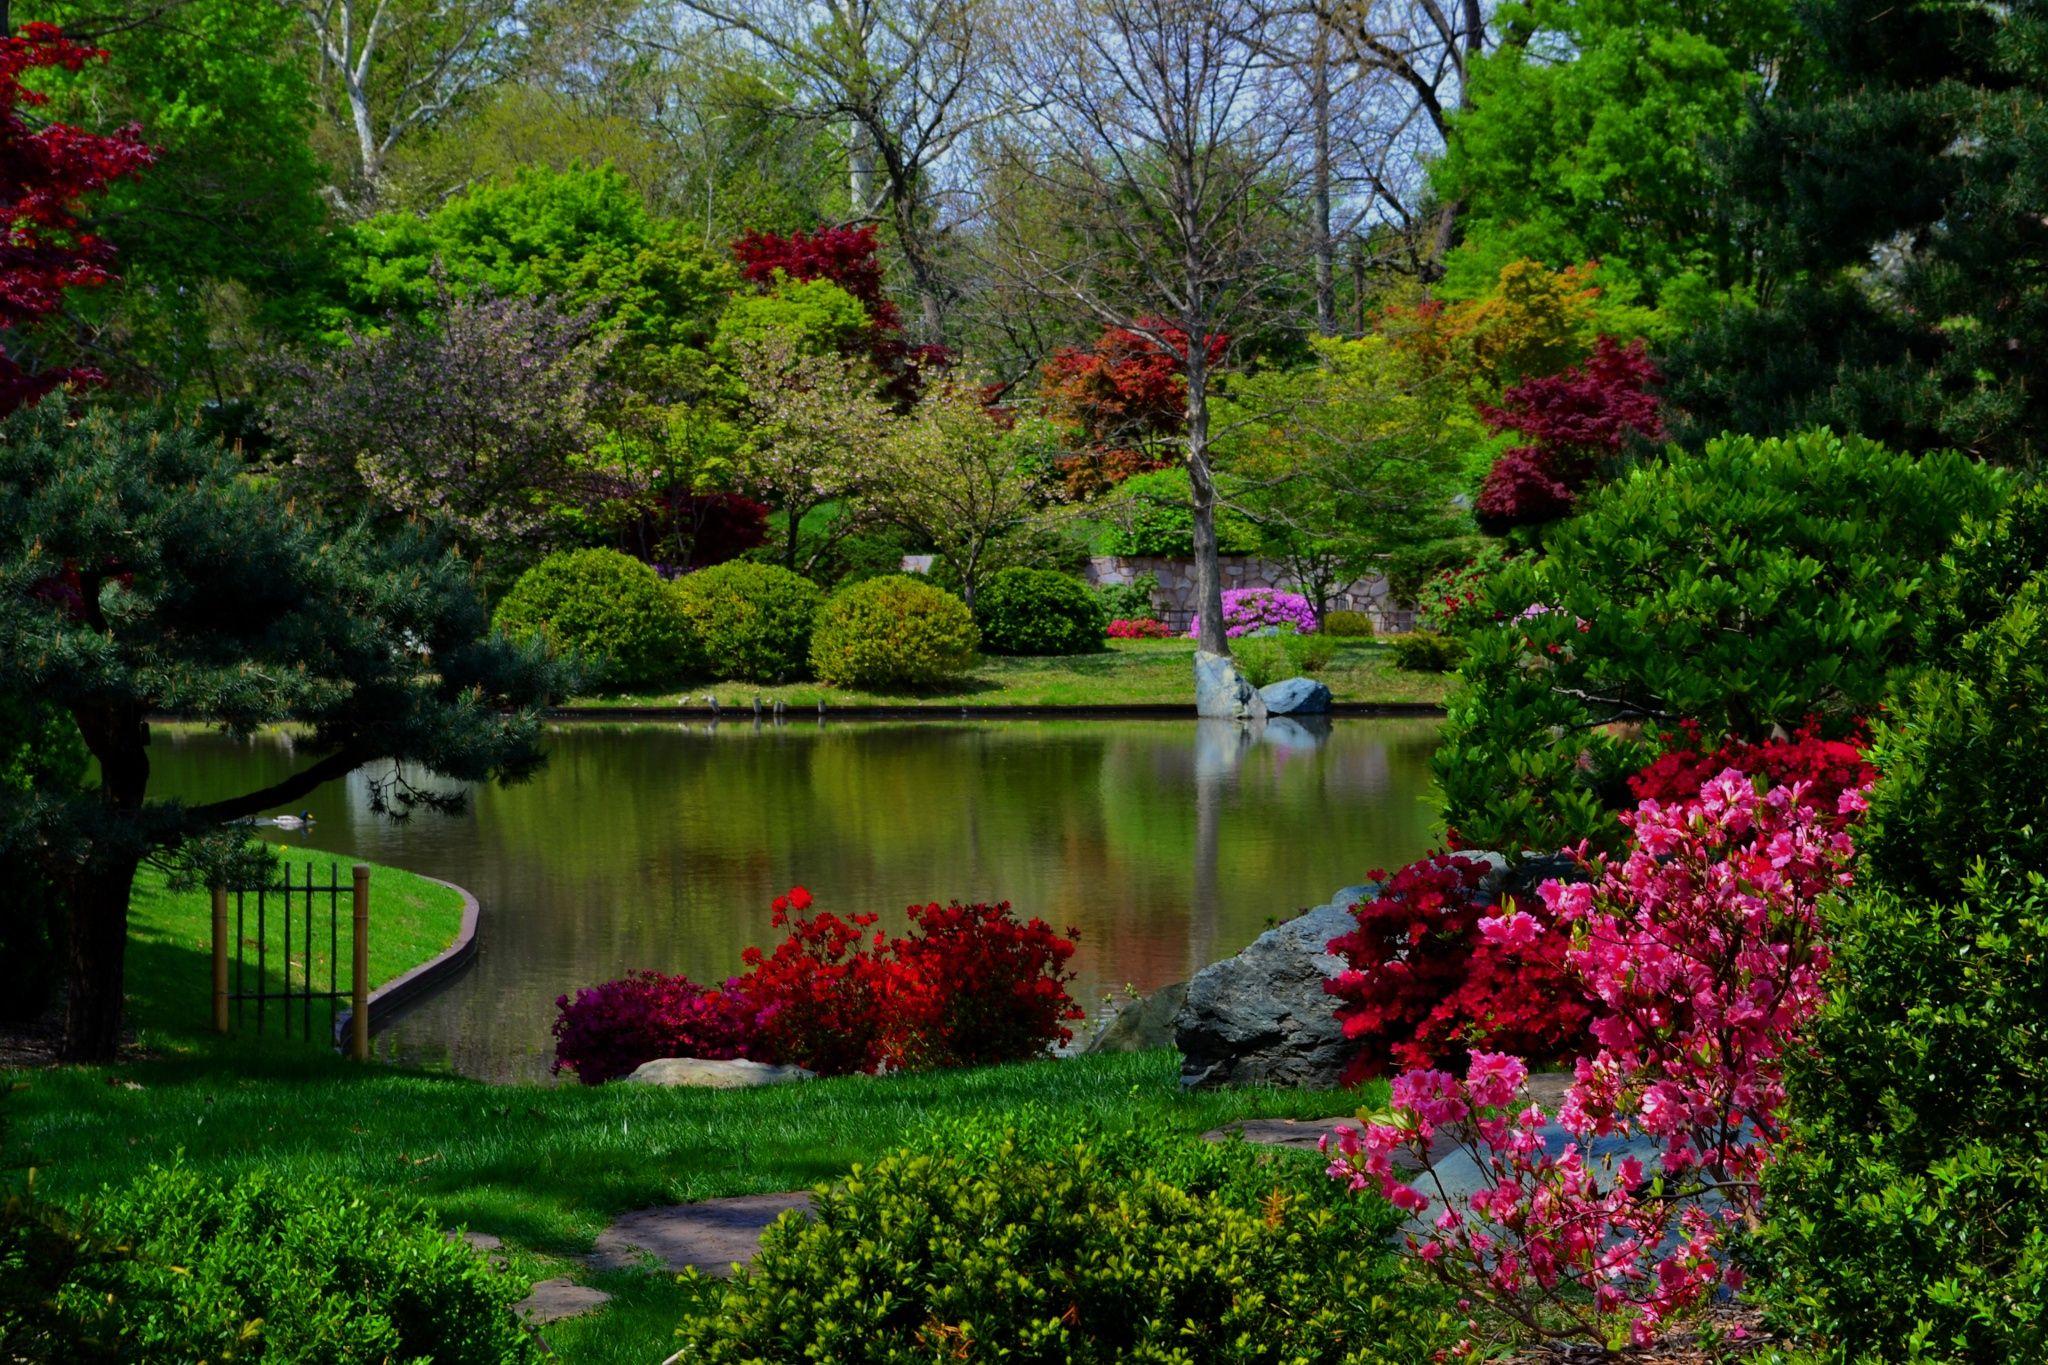 aea121f2f69a9880bd8ec2a520db2f61 - Botanical Gardens St Louis Light Show